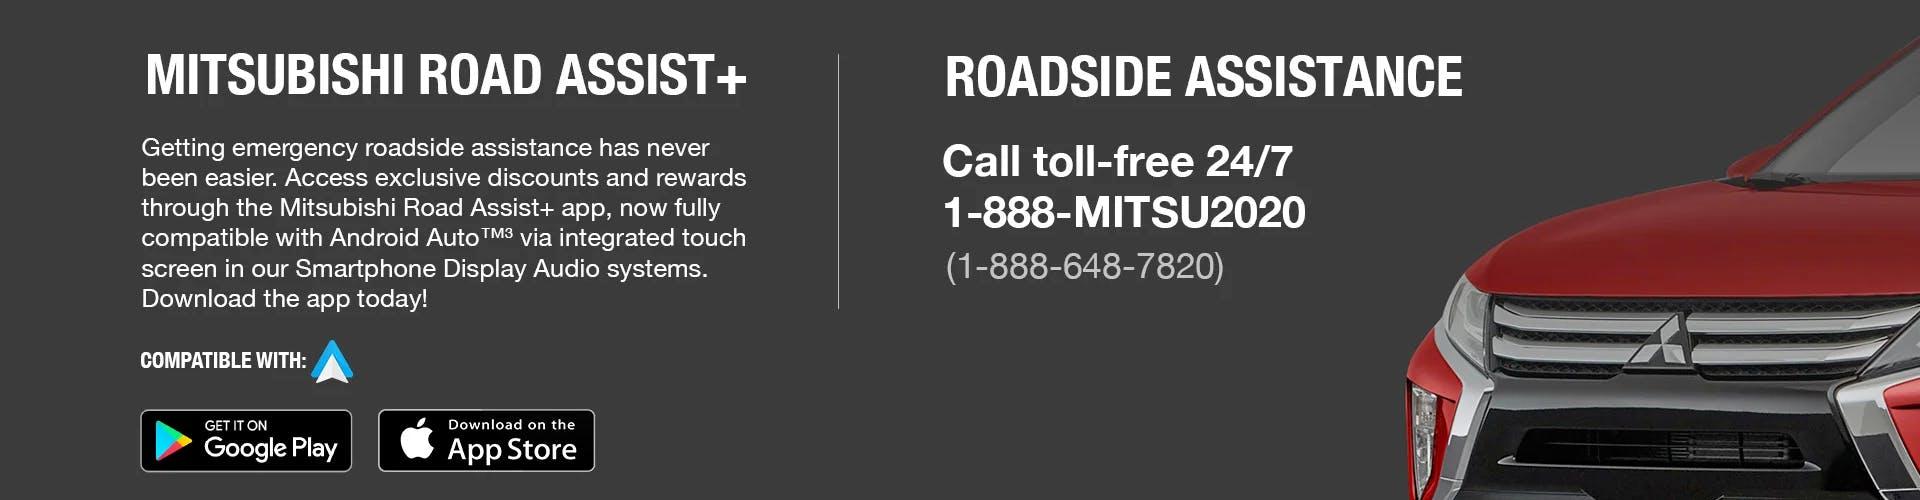 Diehl Mitsu Roadside Assistance